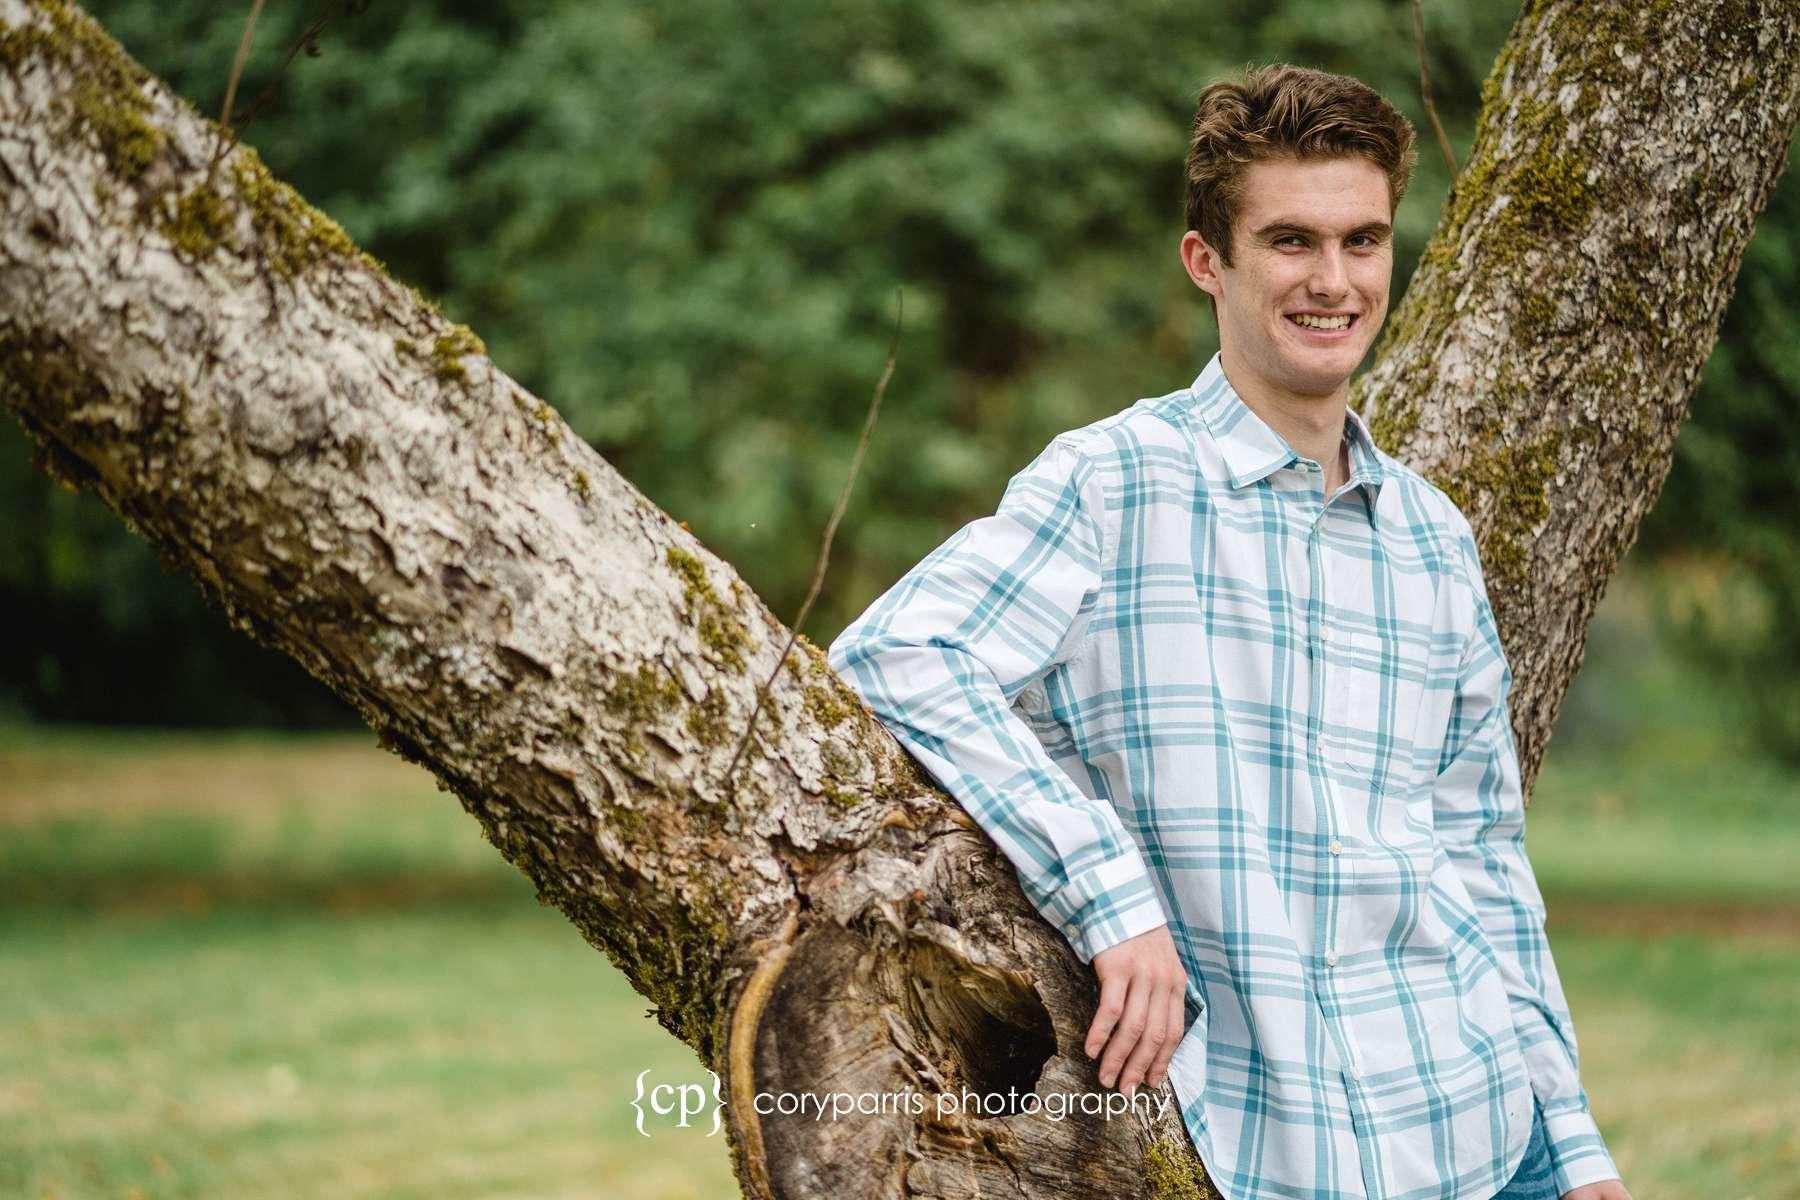 North-Creek-High-School-Senior-Portraits-Bothell-116.jpg